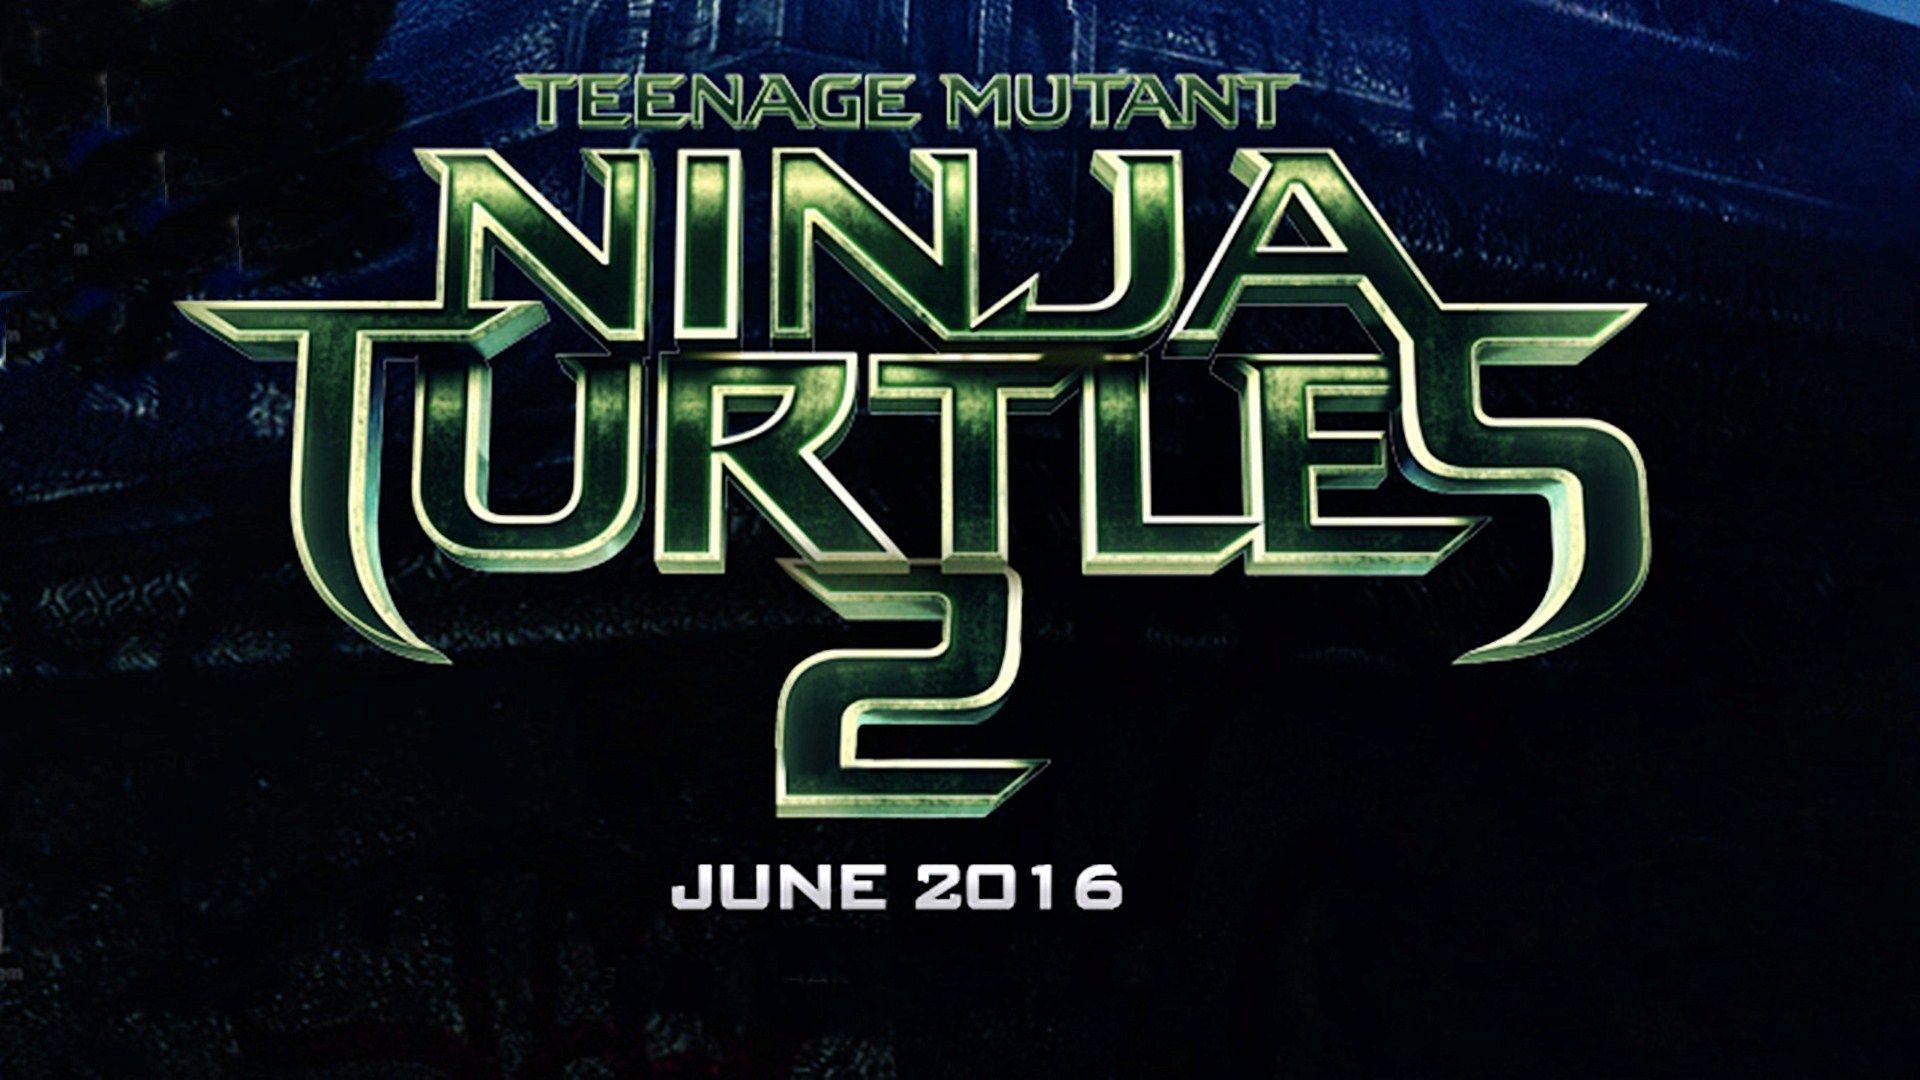 Teenage Mutant Ninja Turtles 2017 Wallpapers - Wallpaper Cave